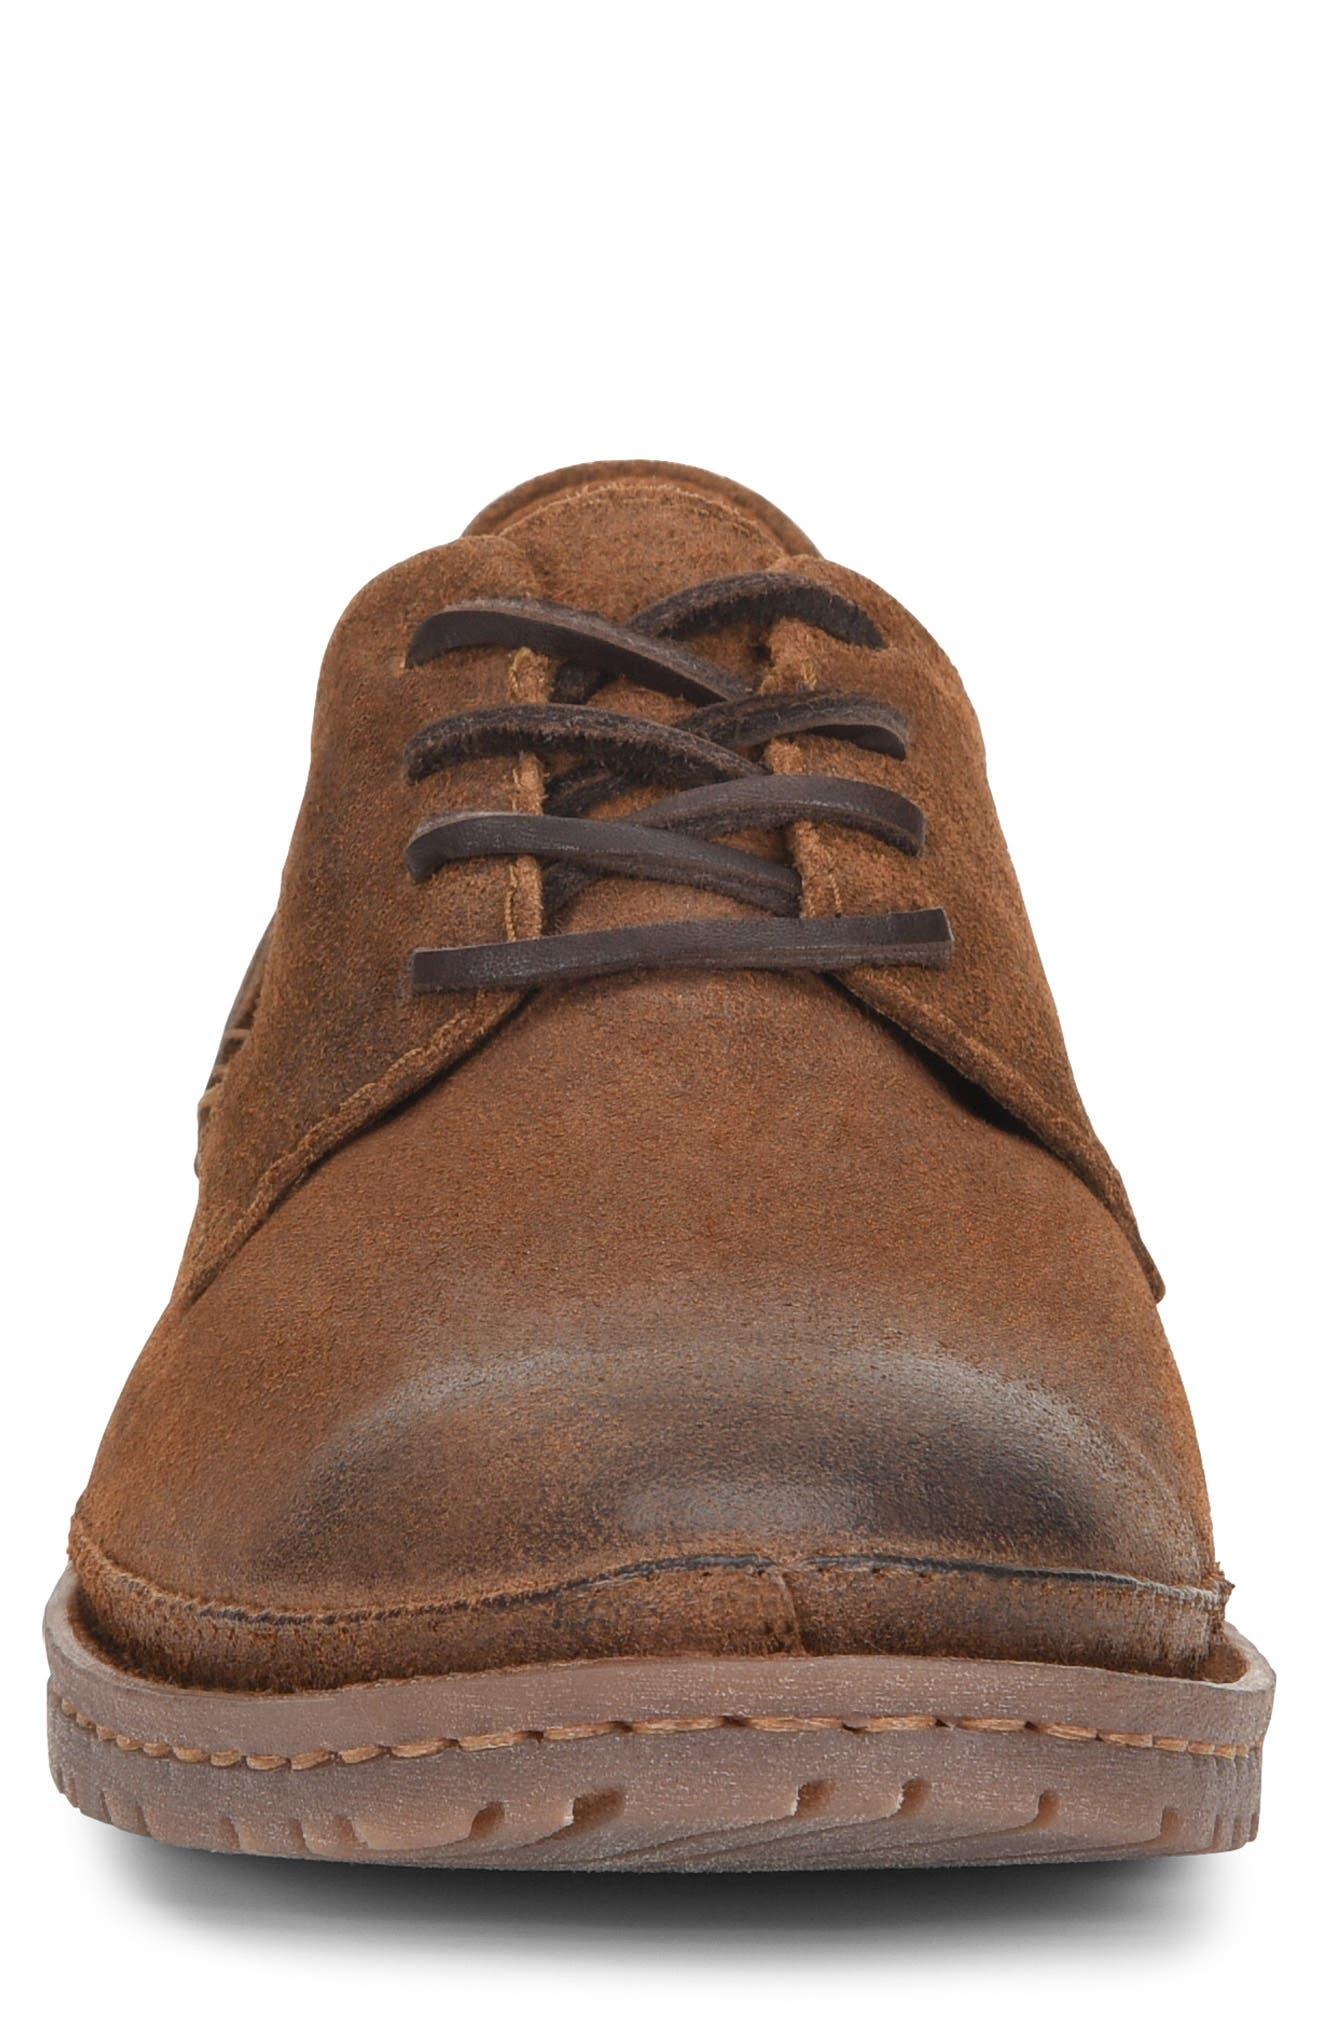 Gilles Plain Toe Derby,                             Alternate thumbnail 6, color,                             Brown/Brown Leather